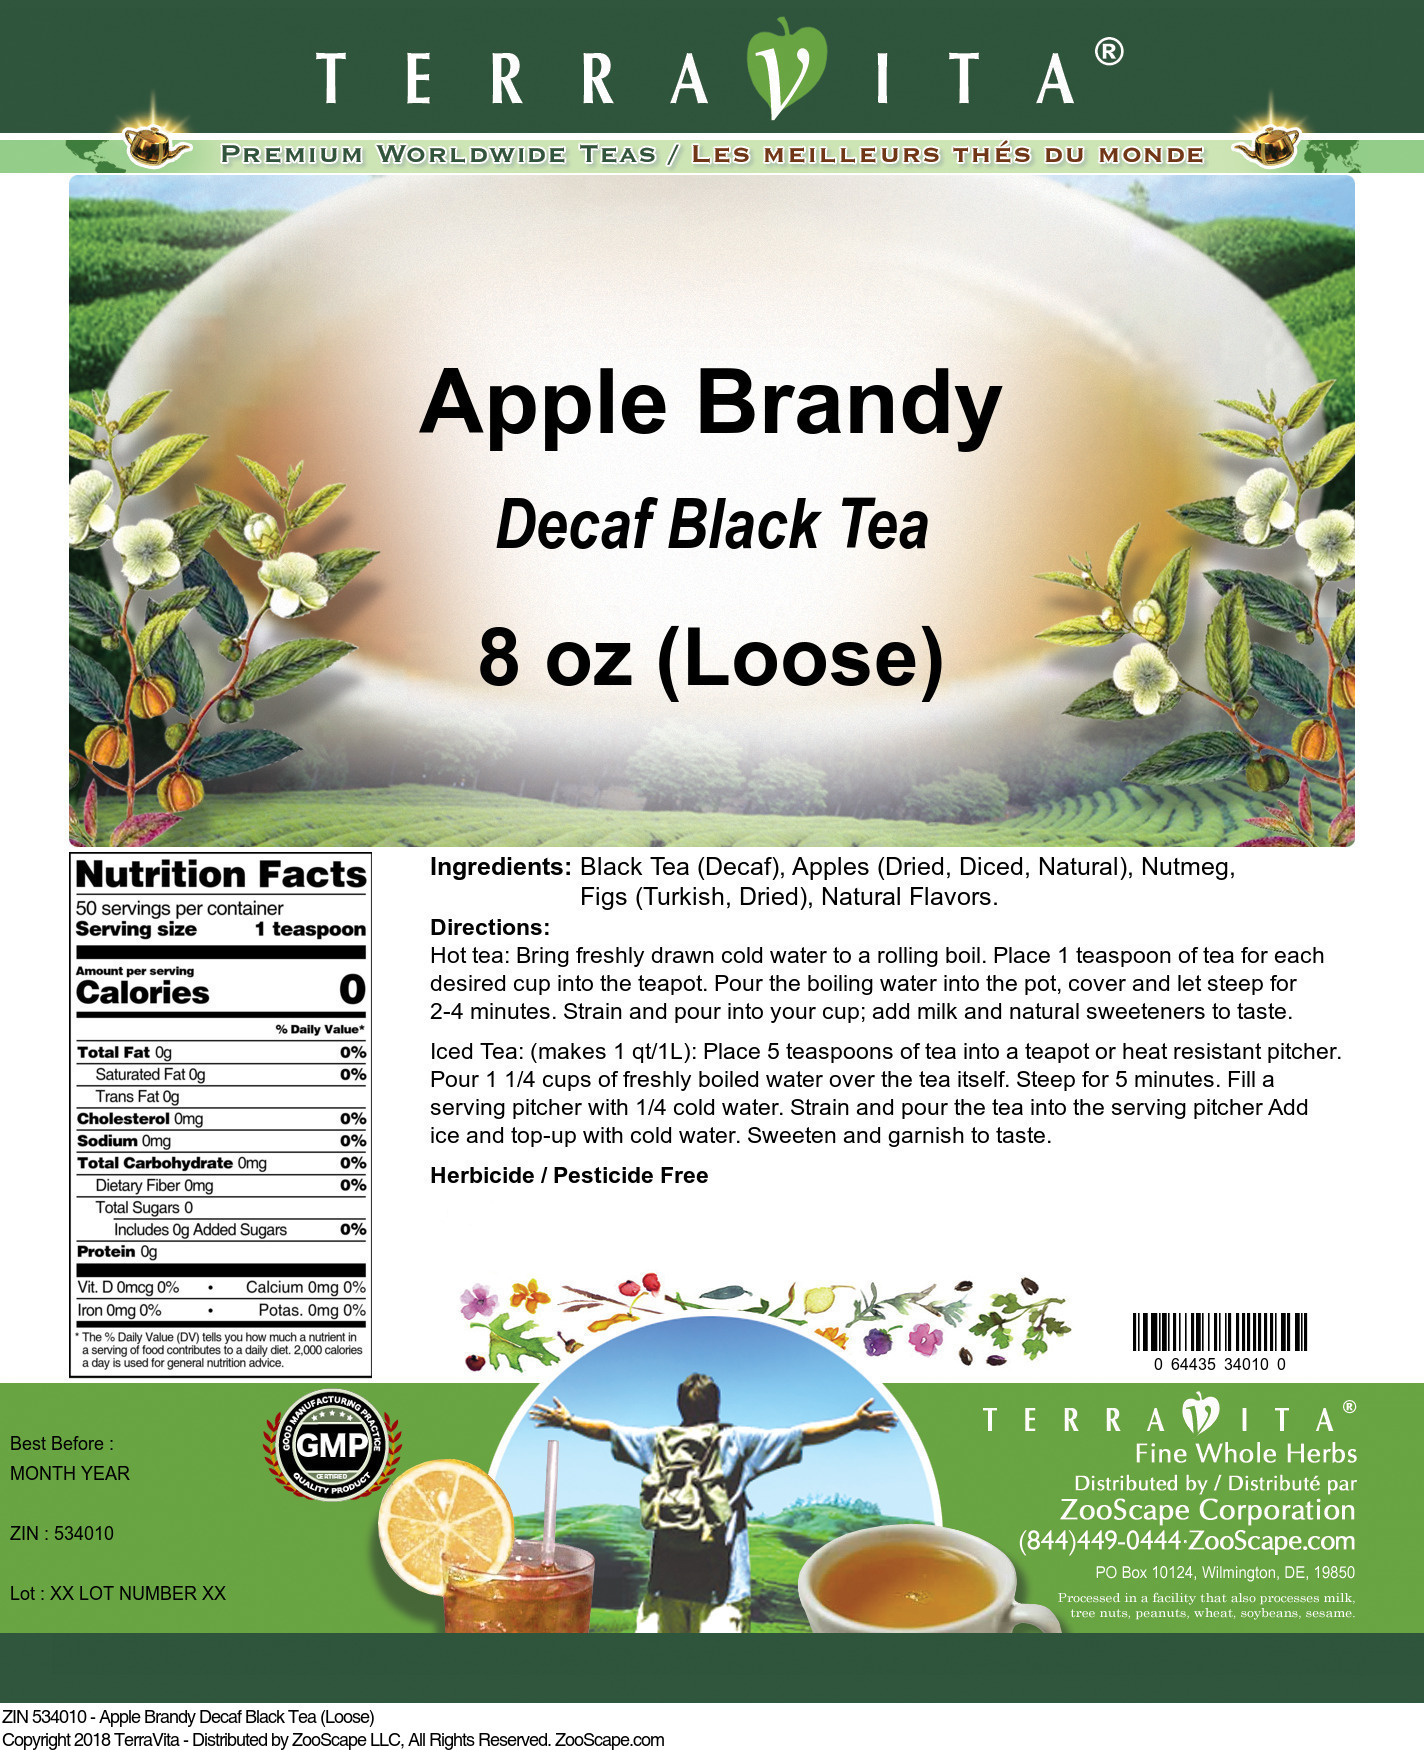 Apple Brandy Decaf Black Tea (Loose)